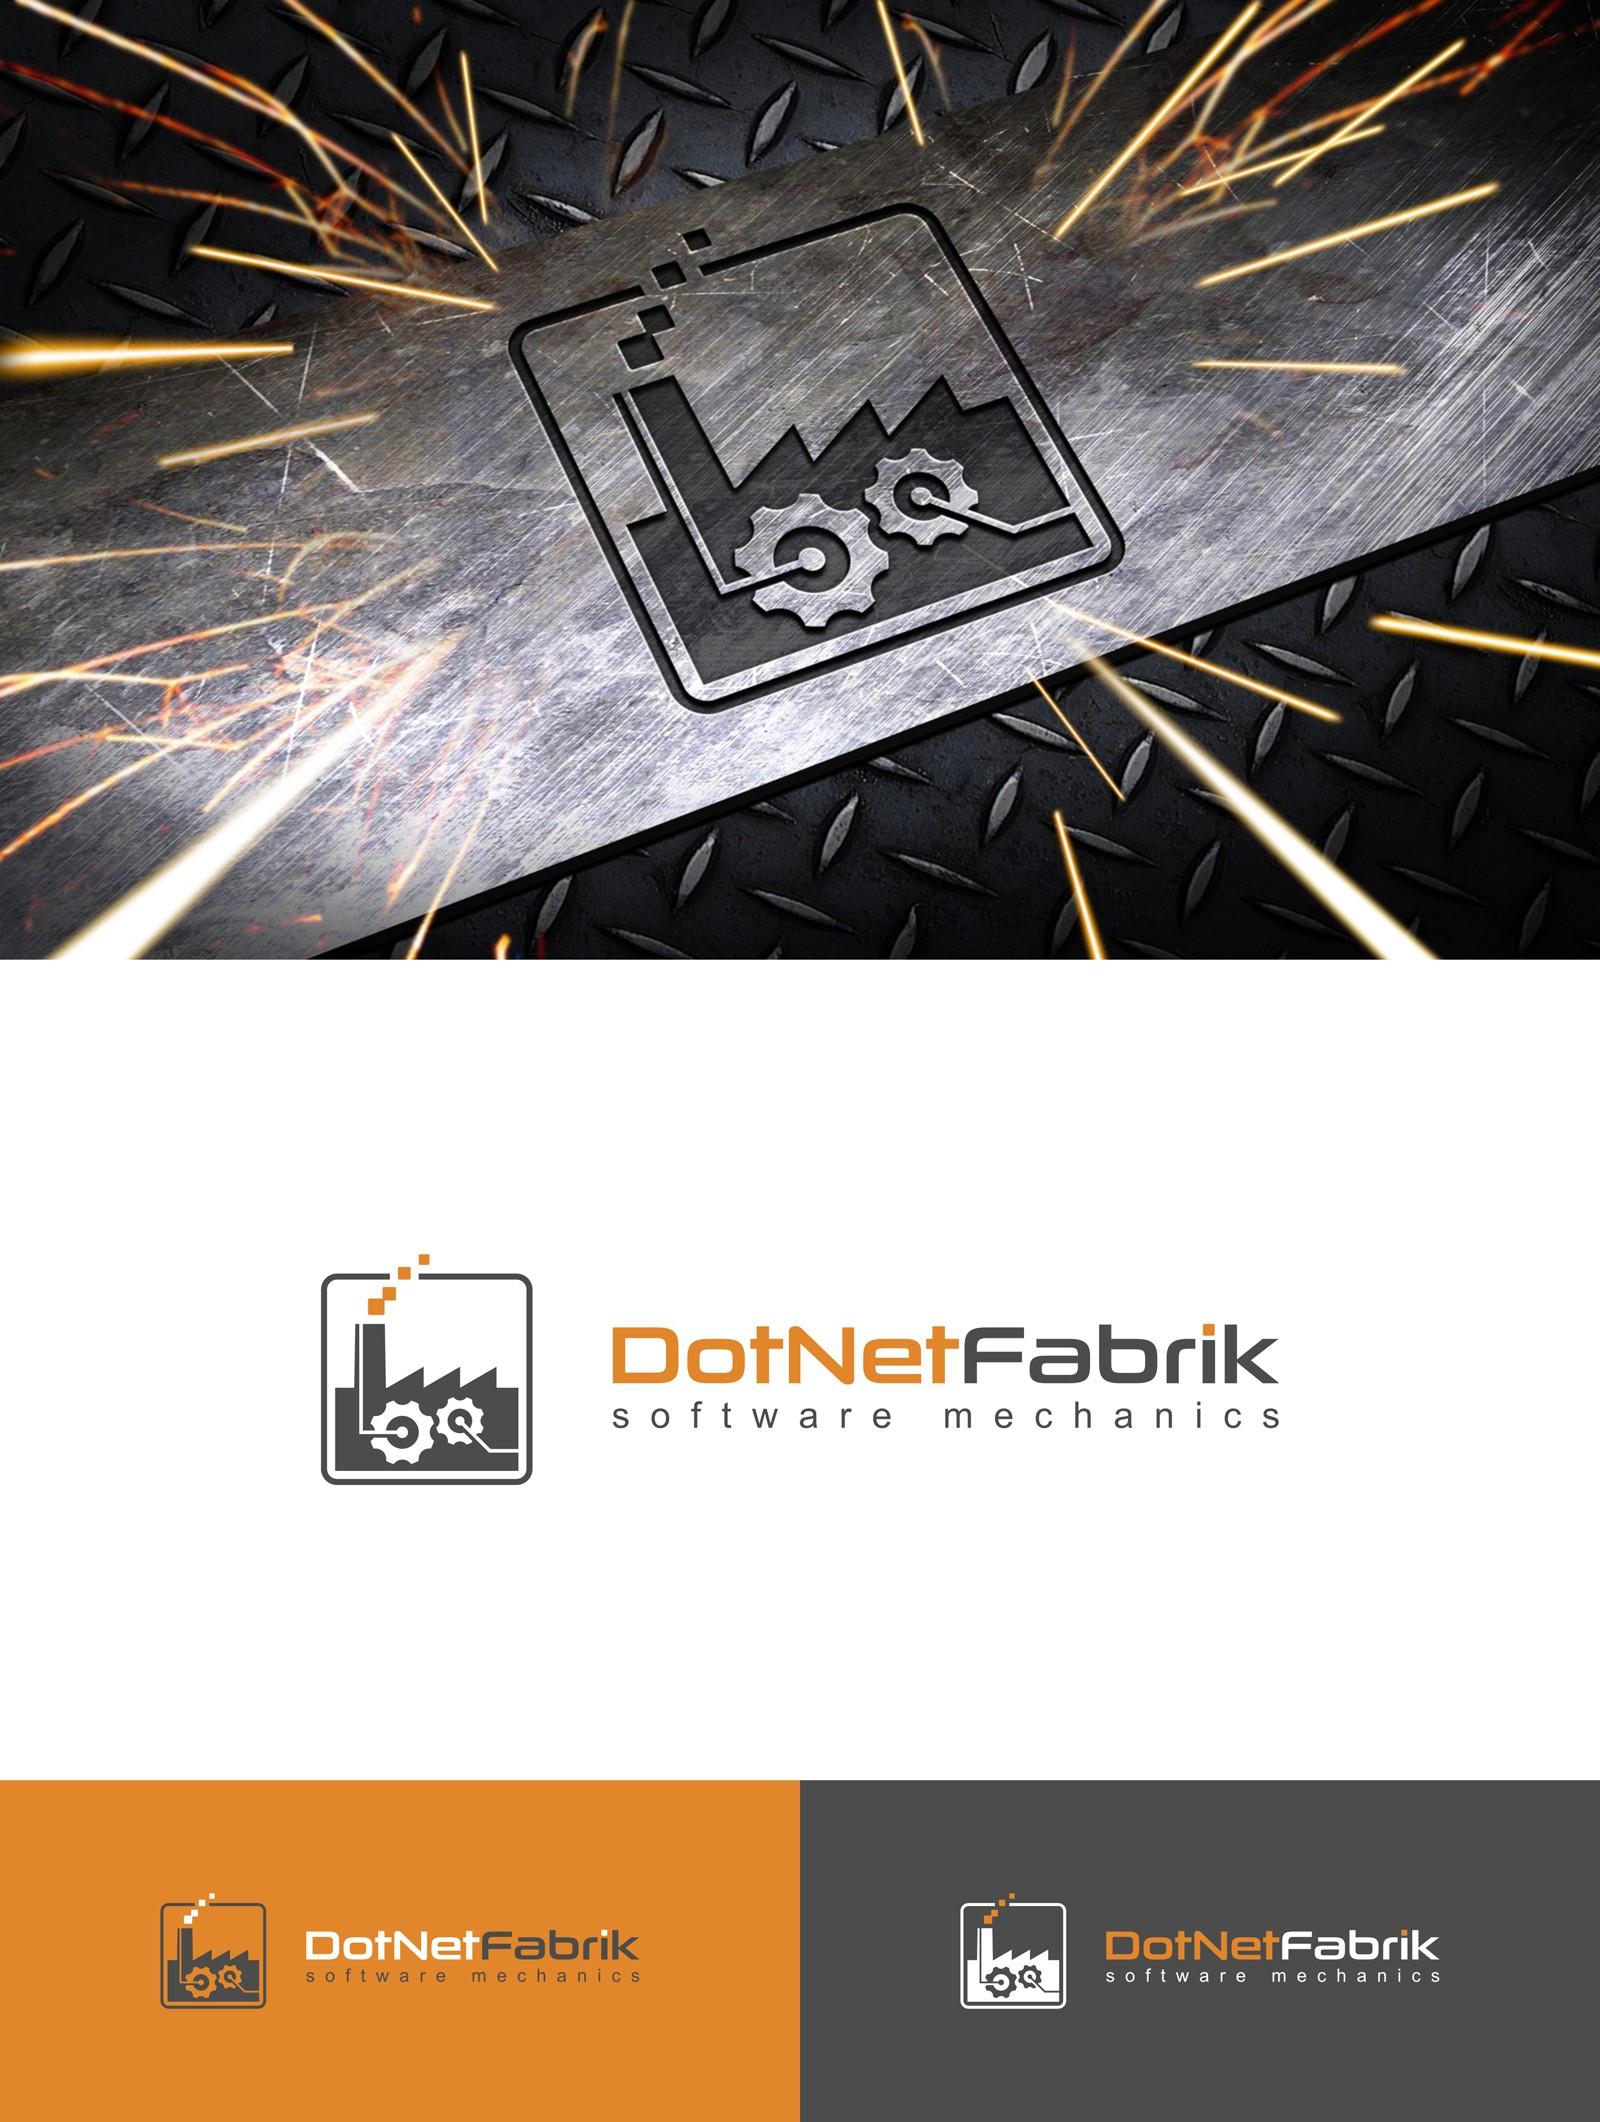 Knackiges Logo für Softwareschmiede gesucht